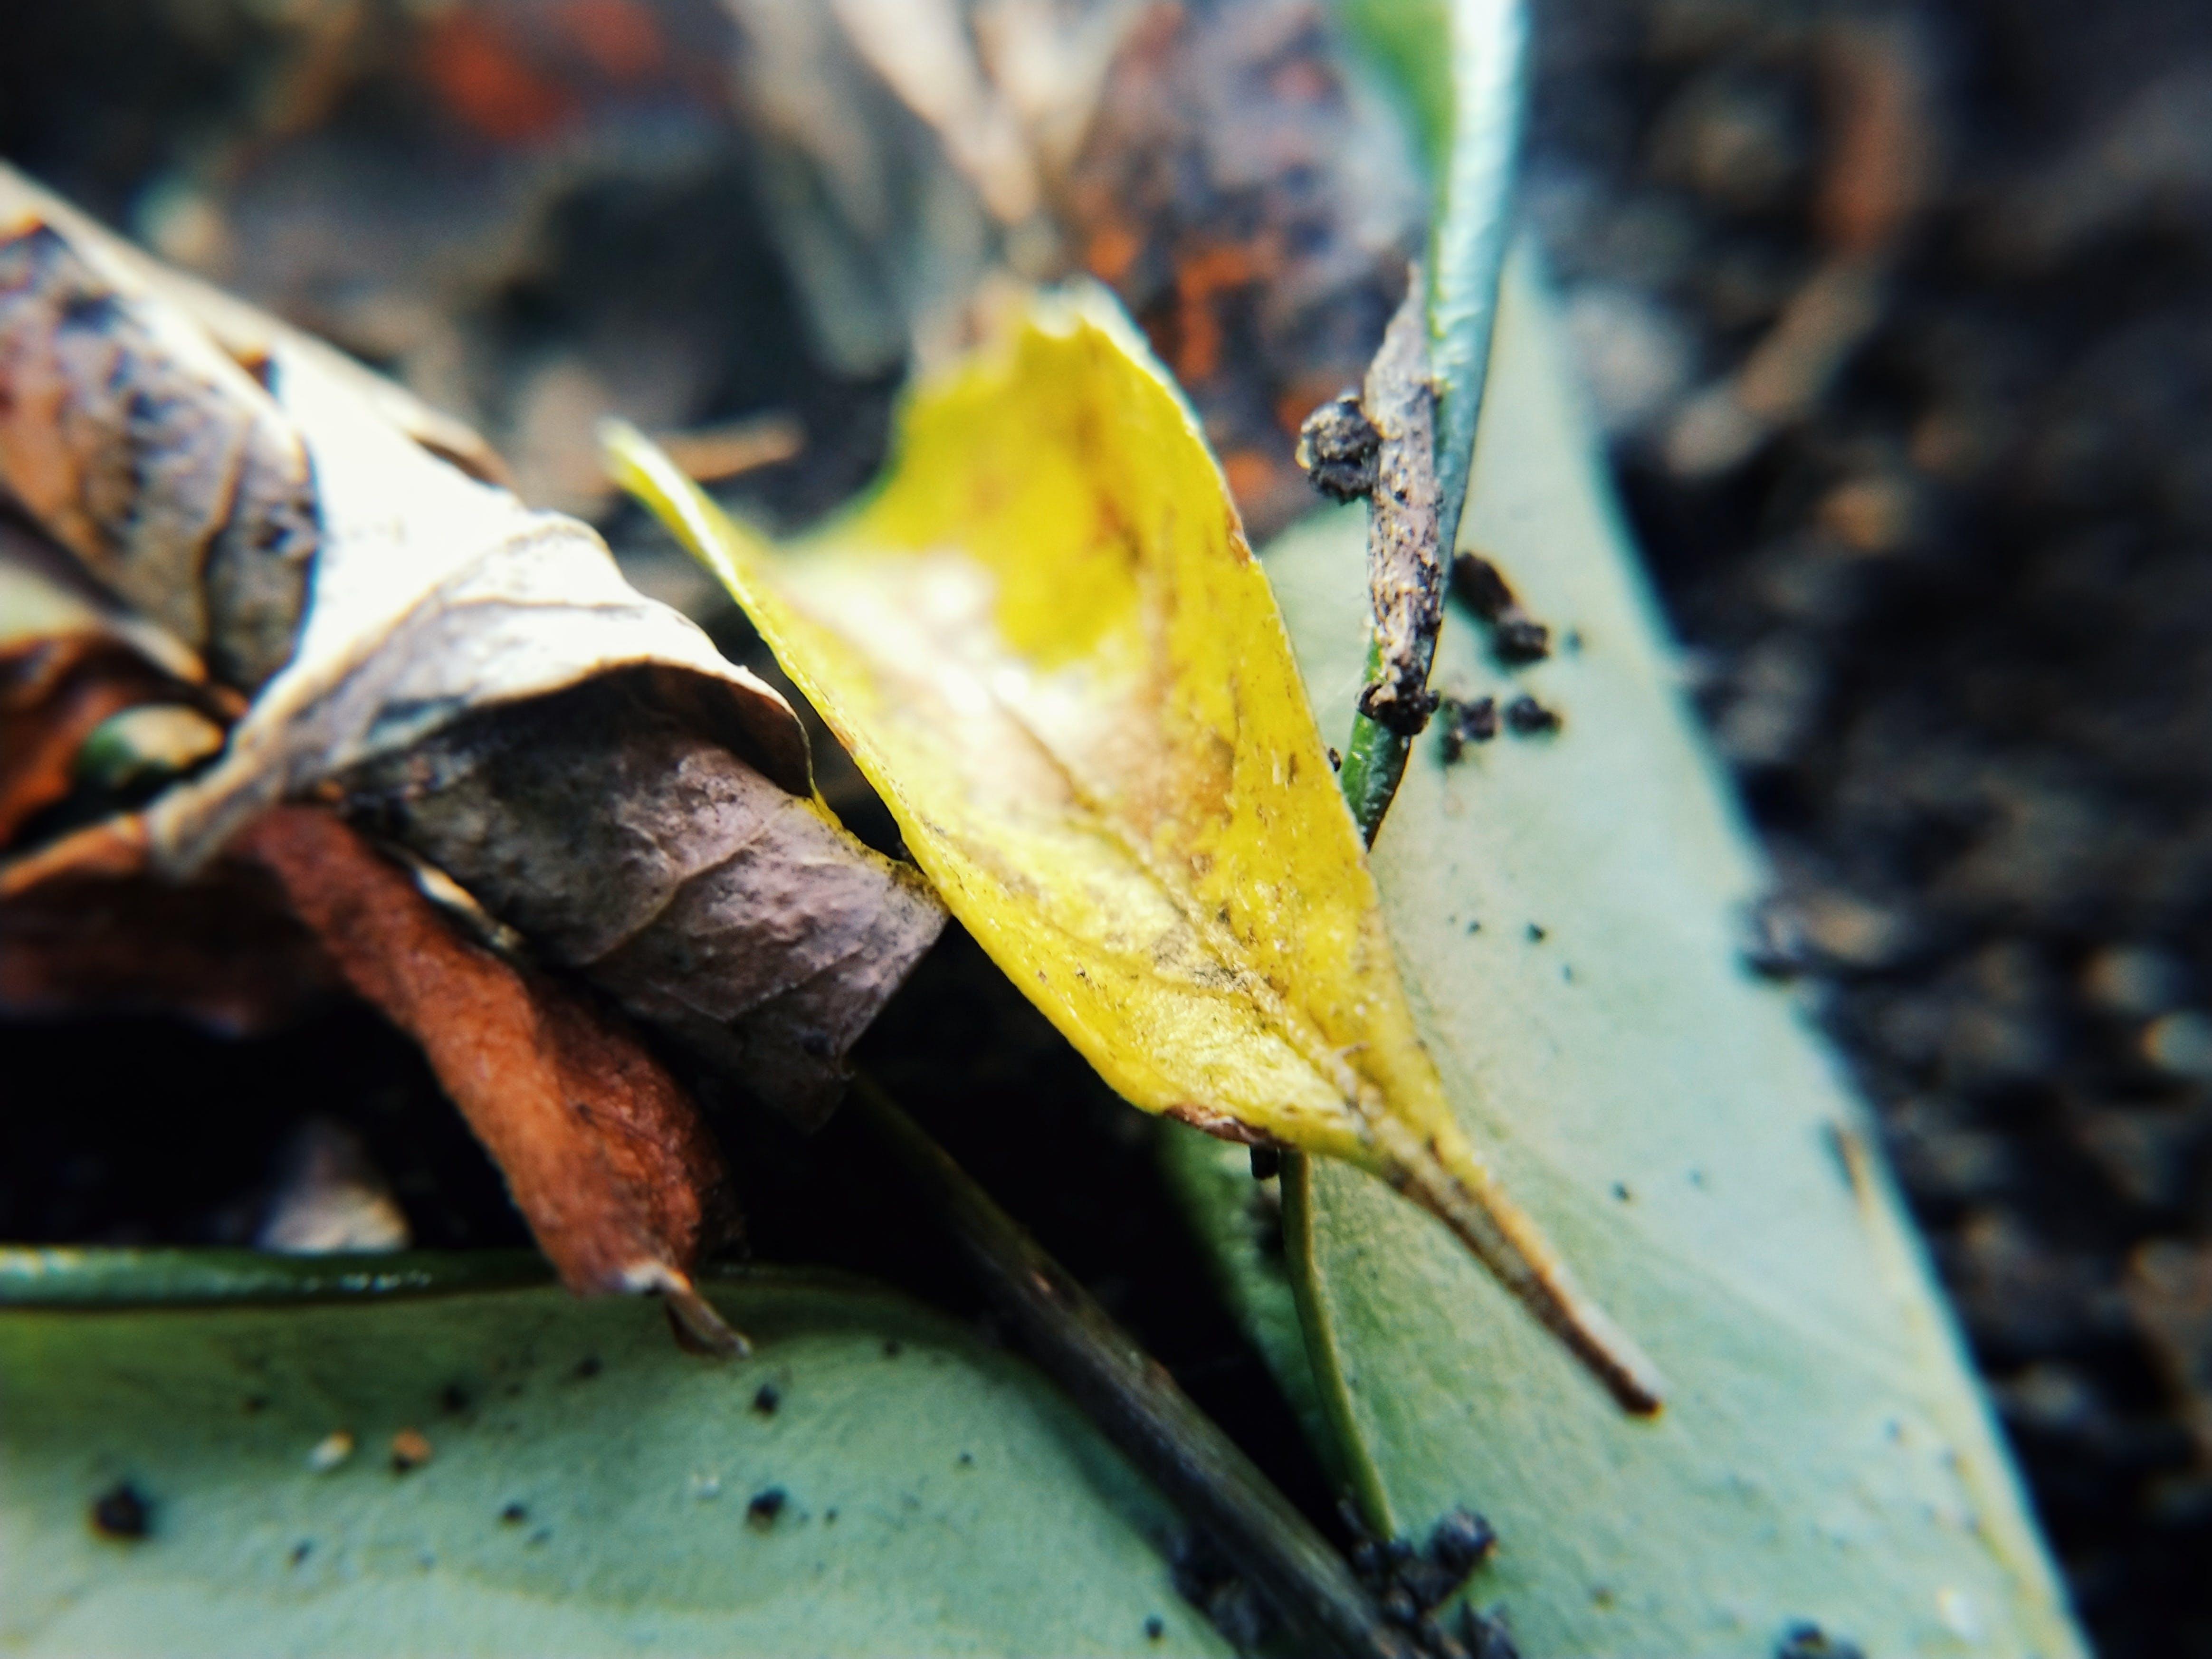 Free stock photo of art, autumn leaf, close-up, grain